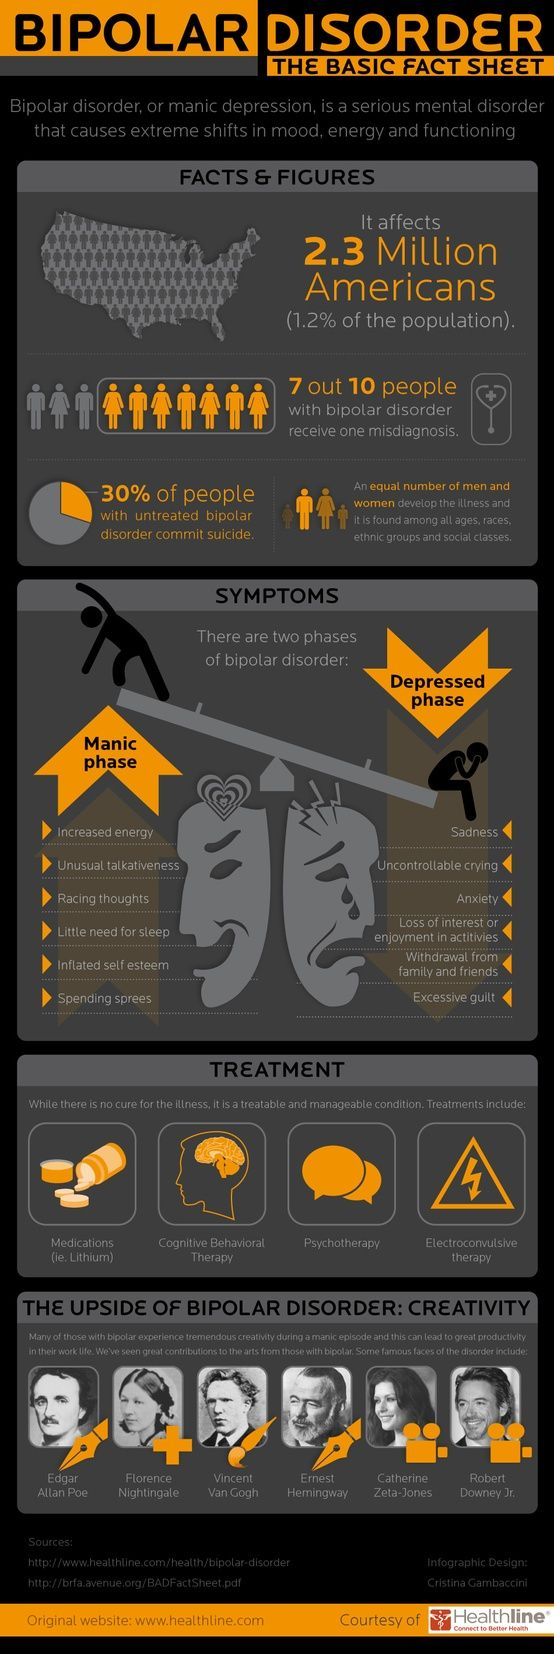 #Bipolar Disorder #Infographic: